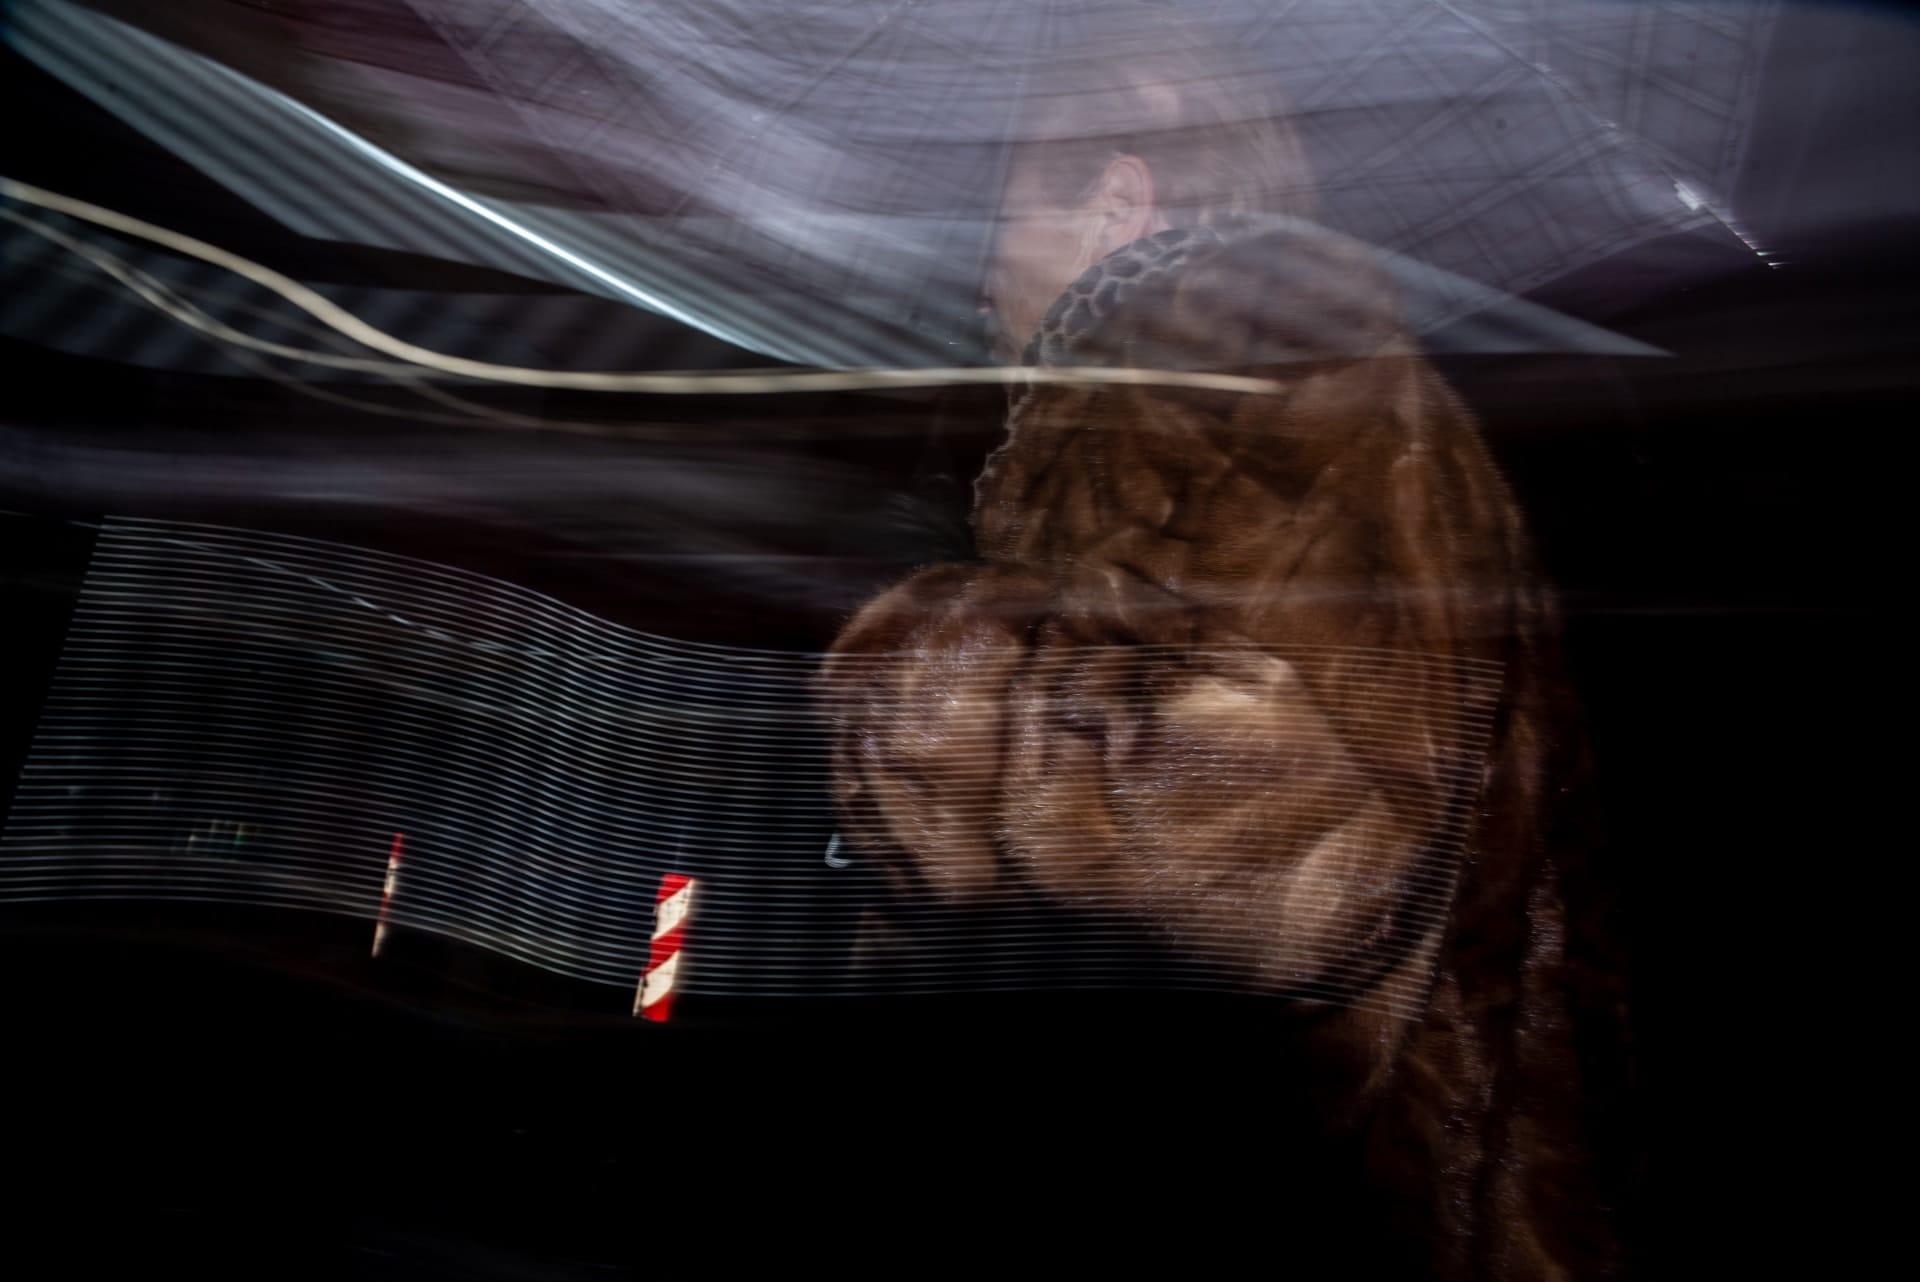 """Flash Street Photography"" Street Photograph by Akis Tachmatzidis"